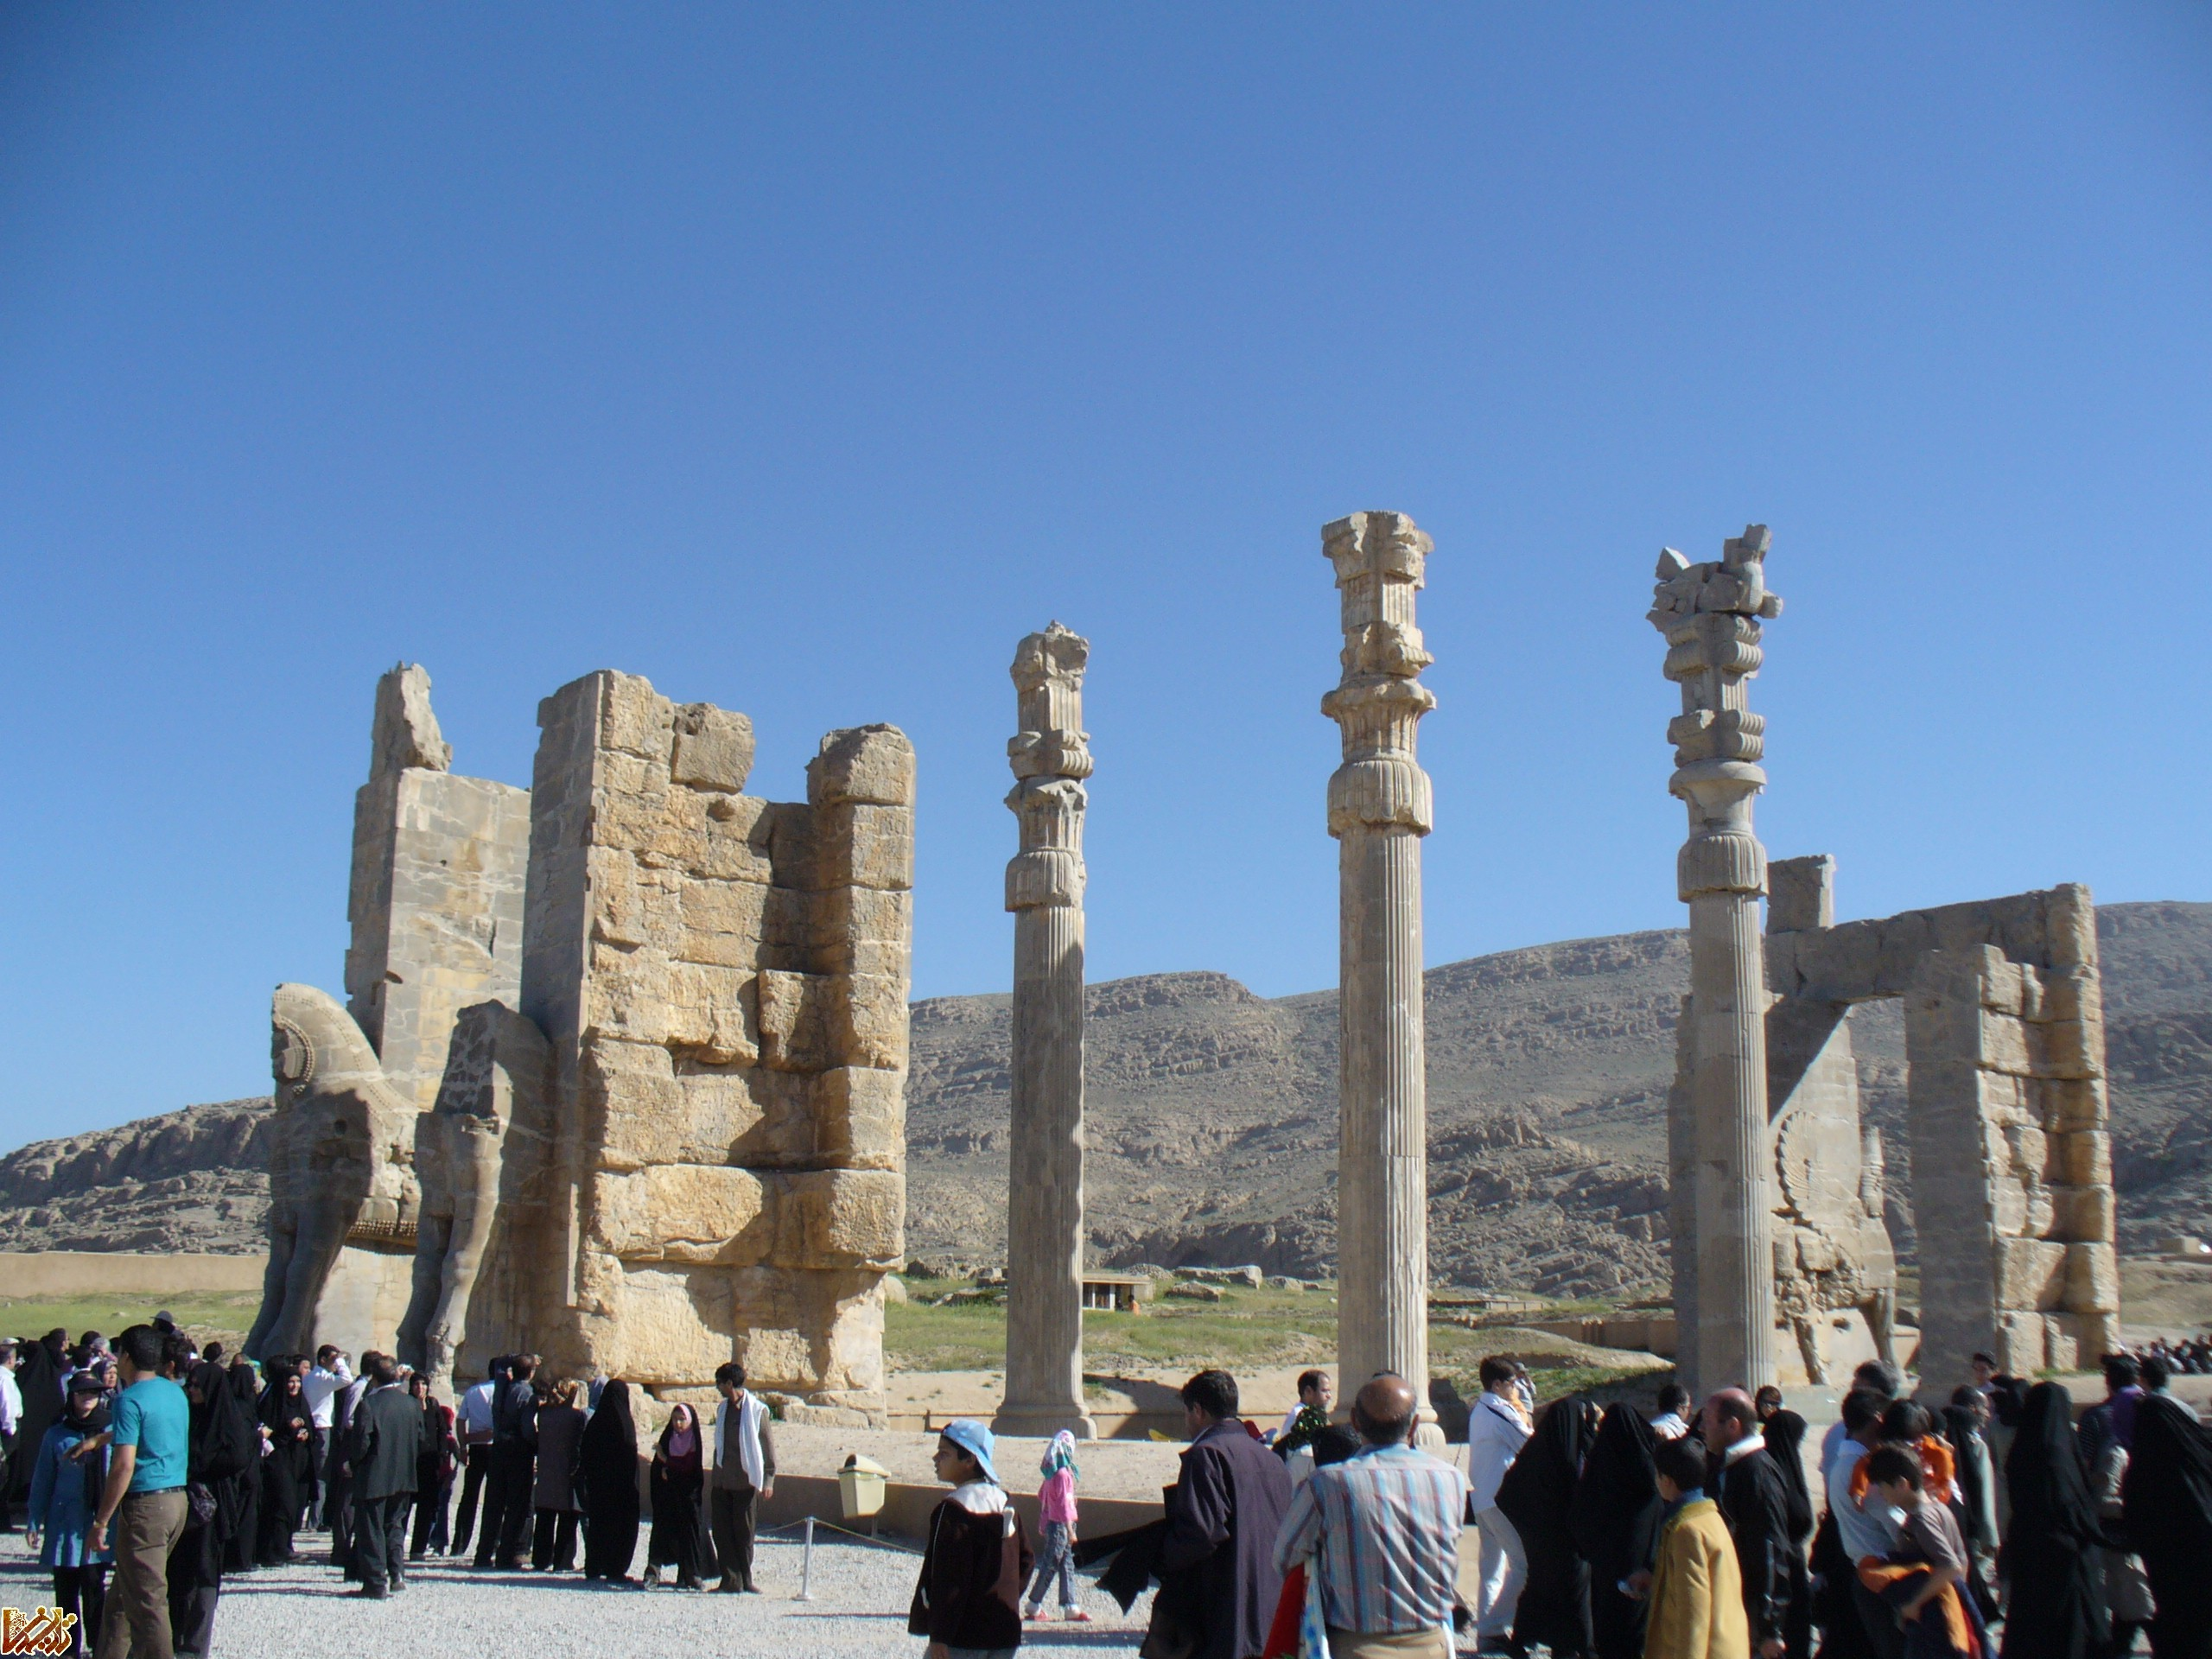 http://tarikhema.org/images/2011/08/343940356.jpg